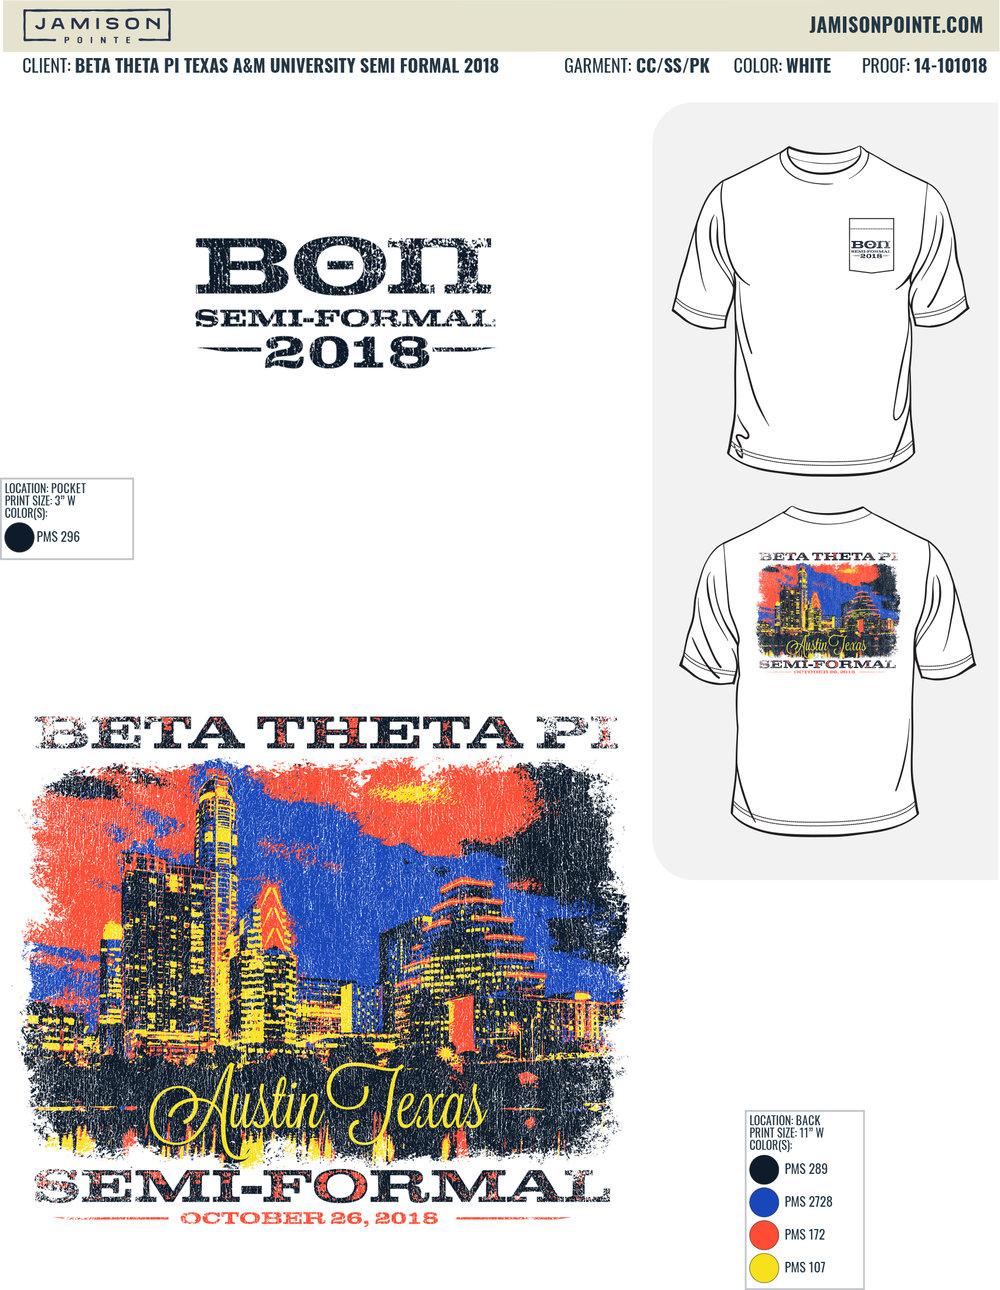 14-101018 Beta Theta Pi Texas A&M University Semi Formal 2018 2.jpg